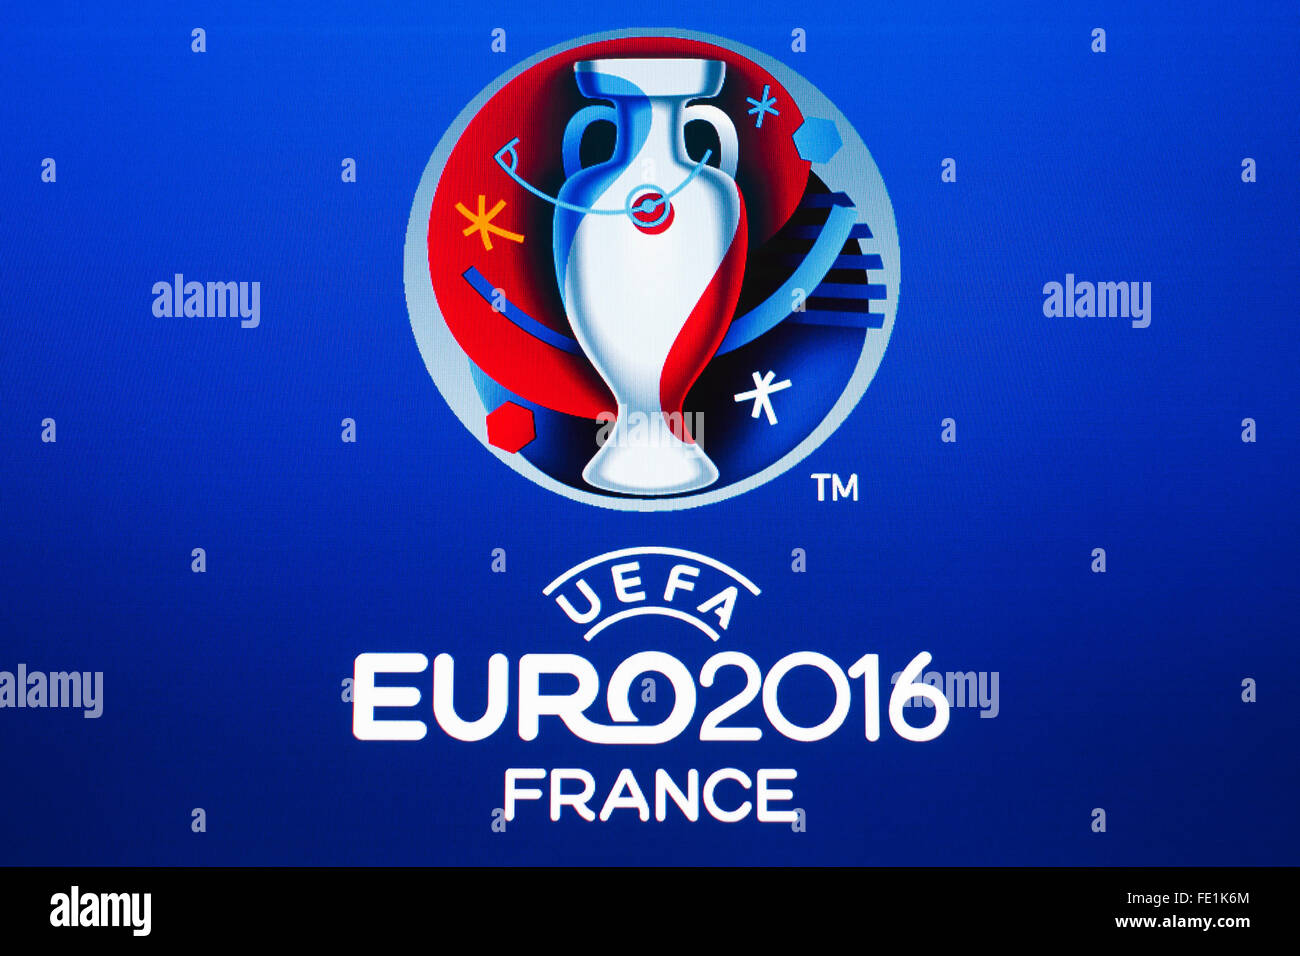 GDANSK, POLAND - NOVEMBER 20, 2015. Logo of the 2016 UEFA European Championship in France on computer screen - Stock Image